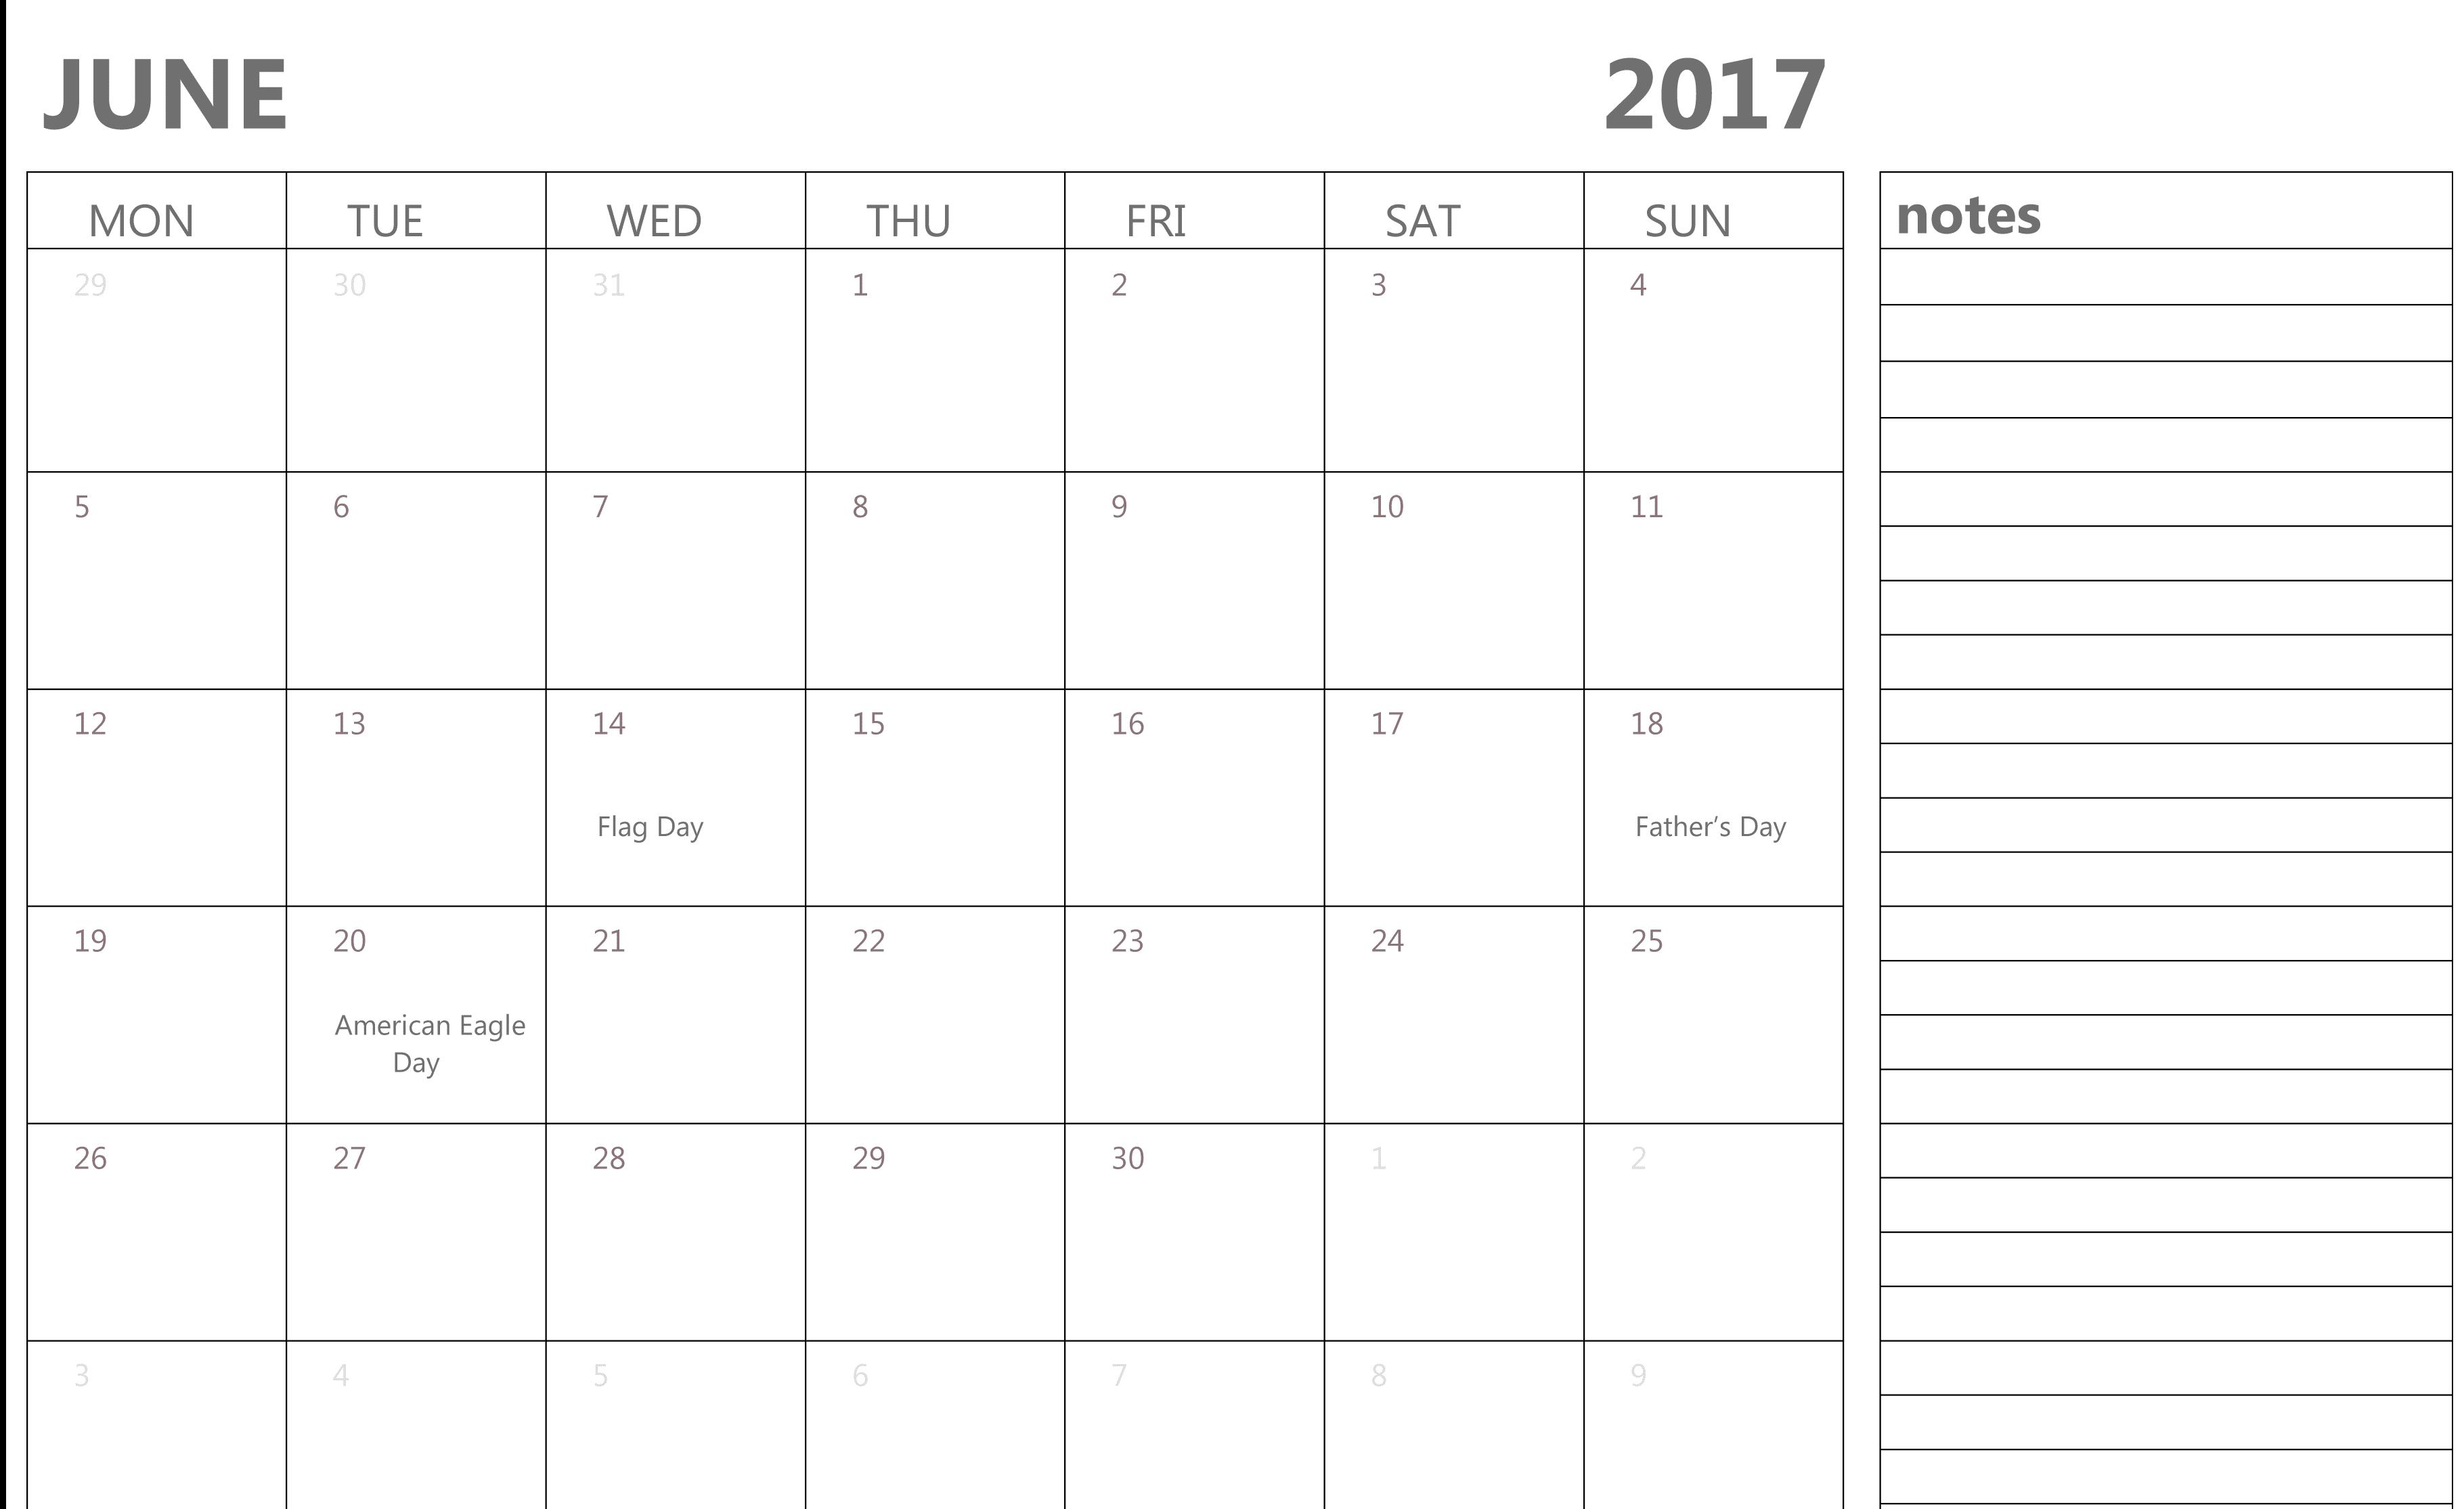 2017 June Calendar Image with Festivals